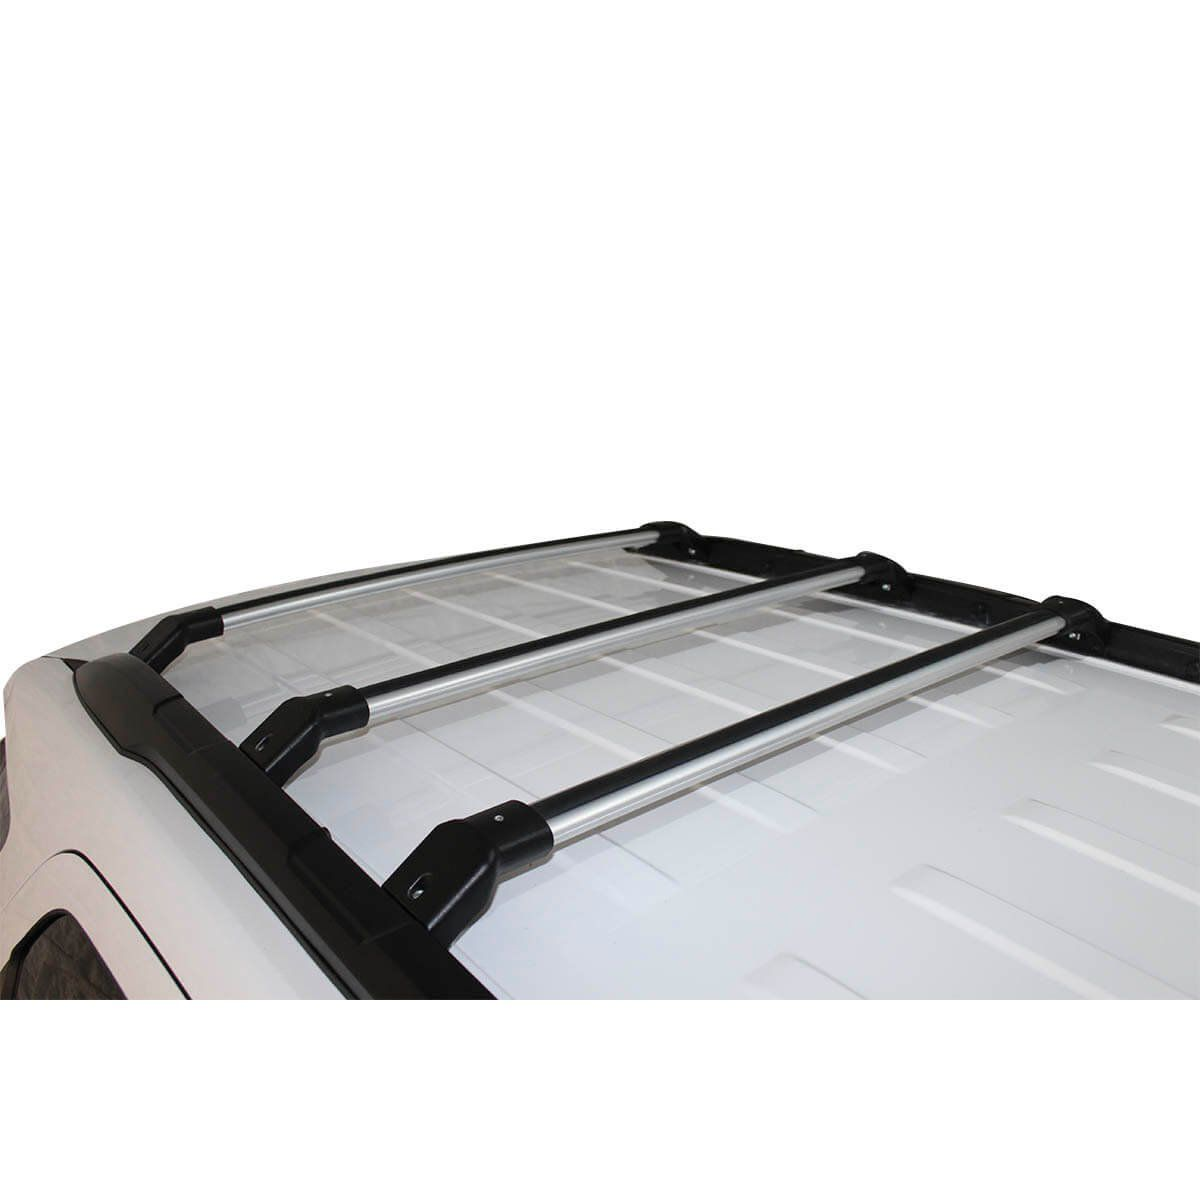 Travessa rack de teto Ecosport 2013 a 2021 kit 3 peças larga anodizada